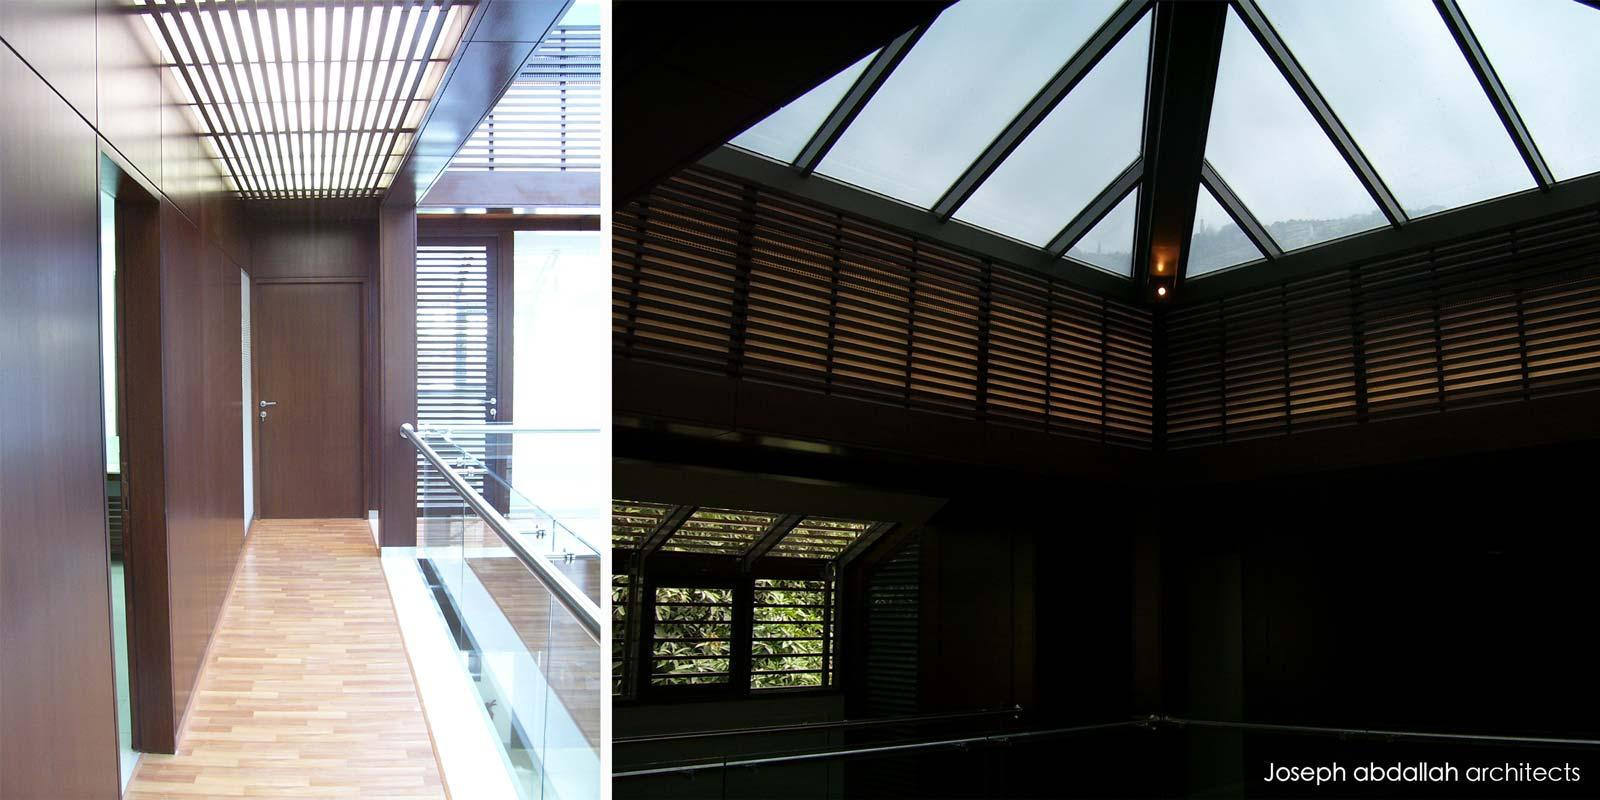 bank-lcb-sgbl-apotres-restoration-architecture-joseph-abdallah-architects-16